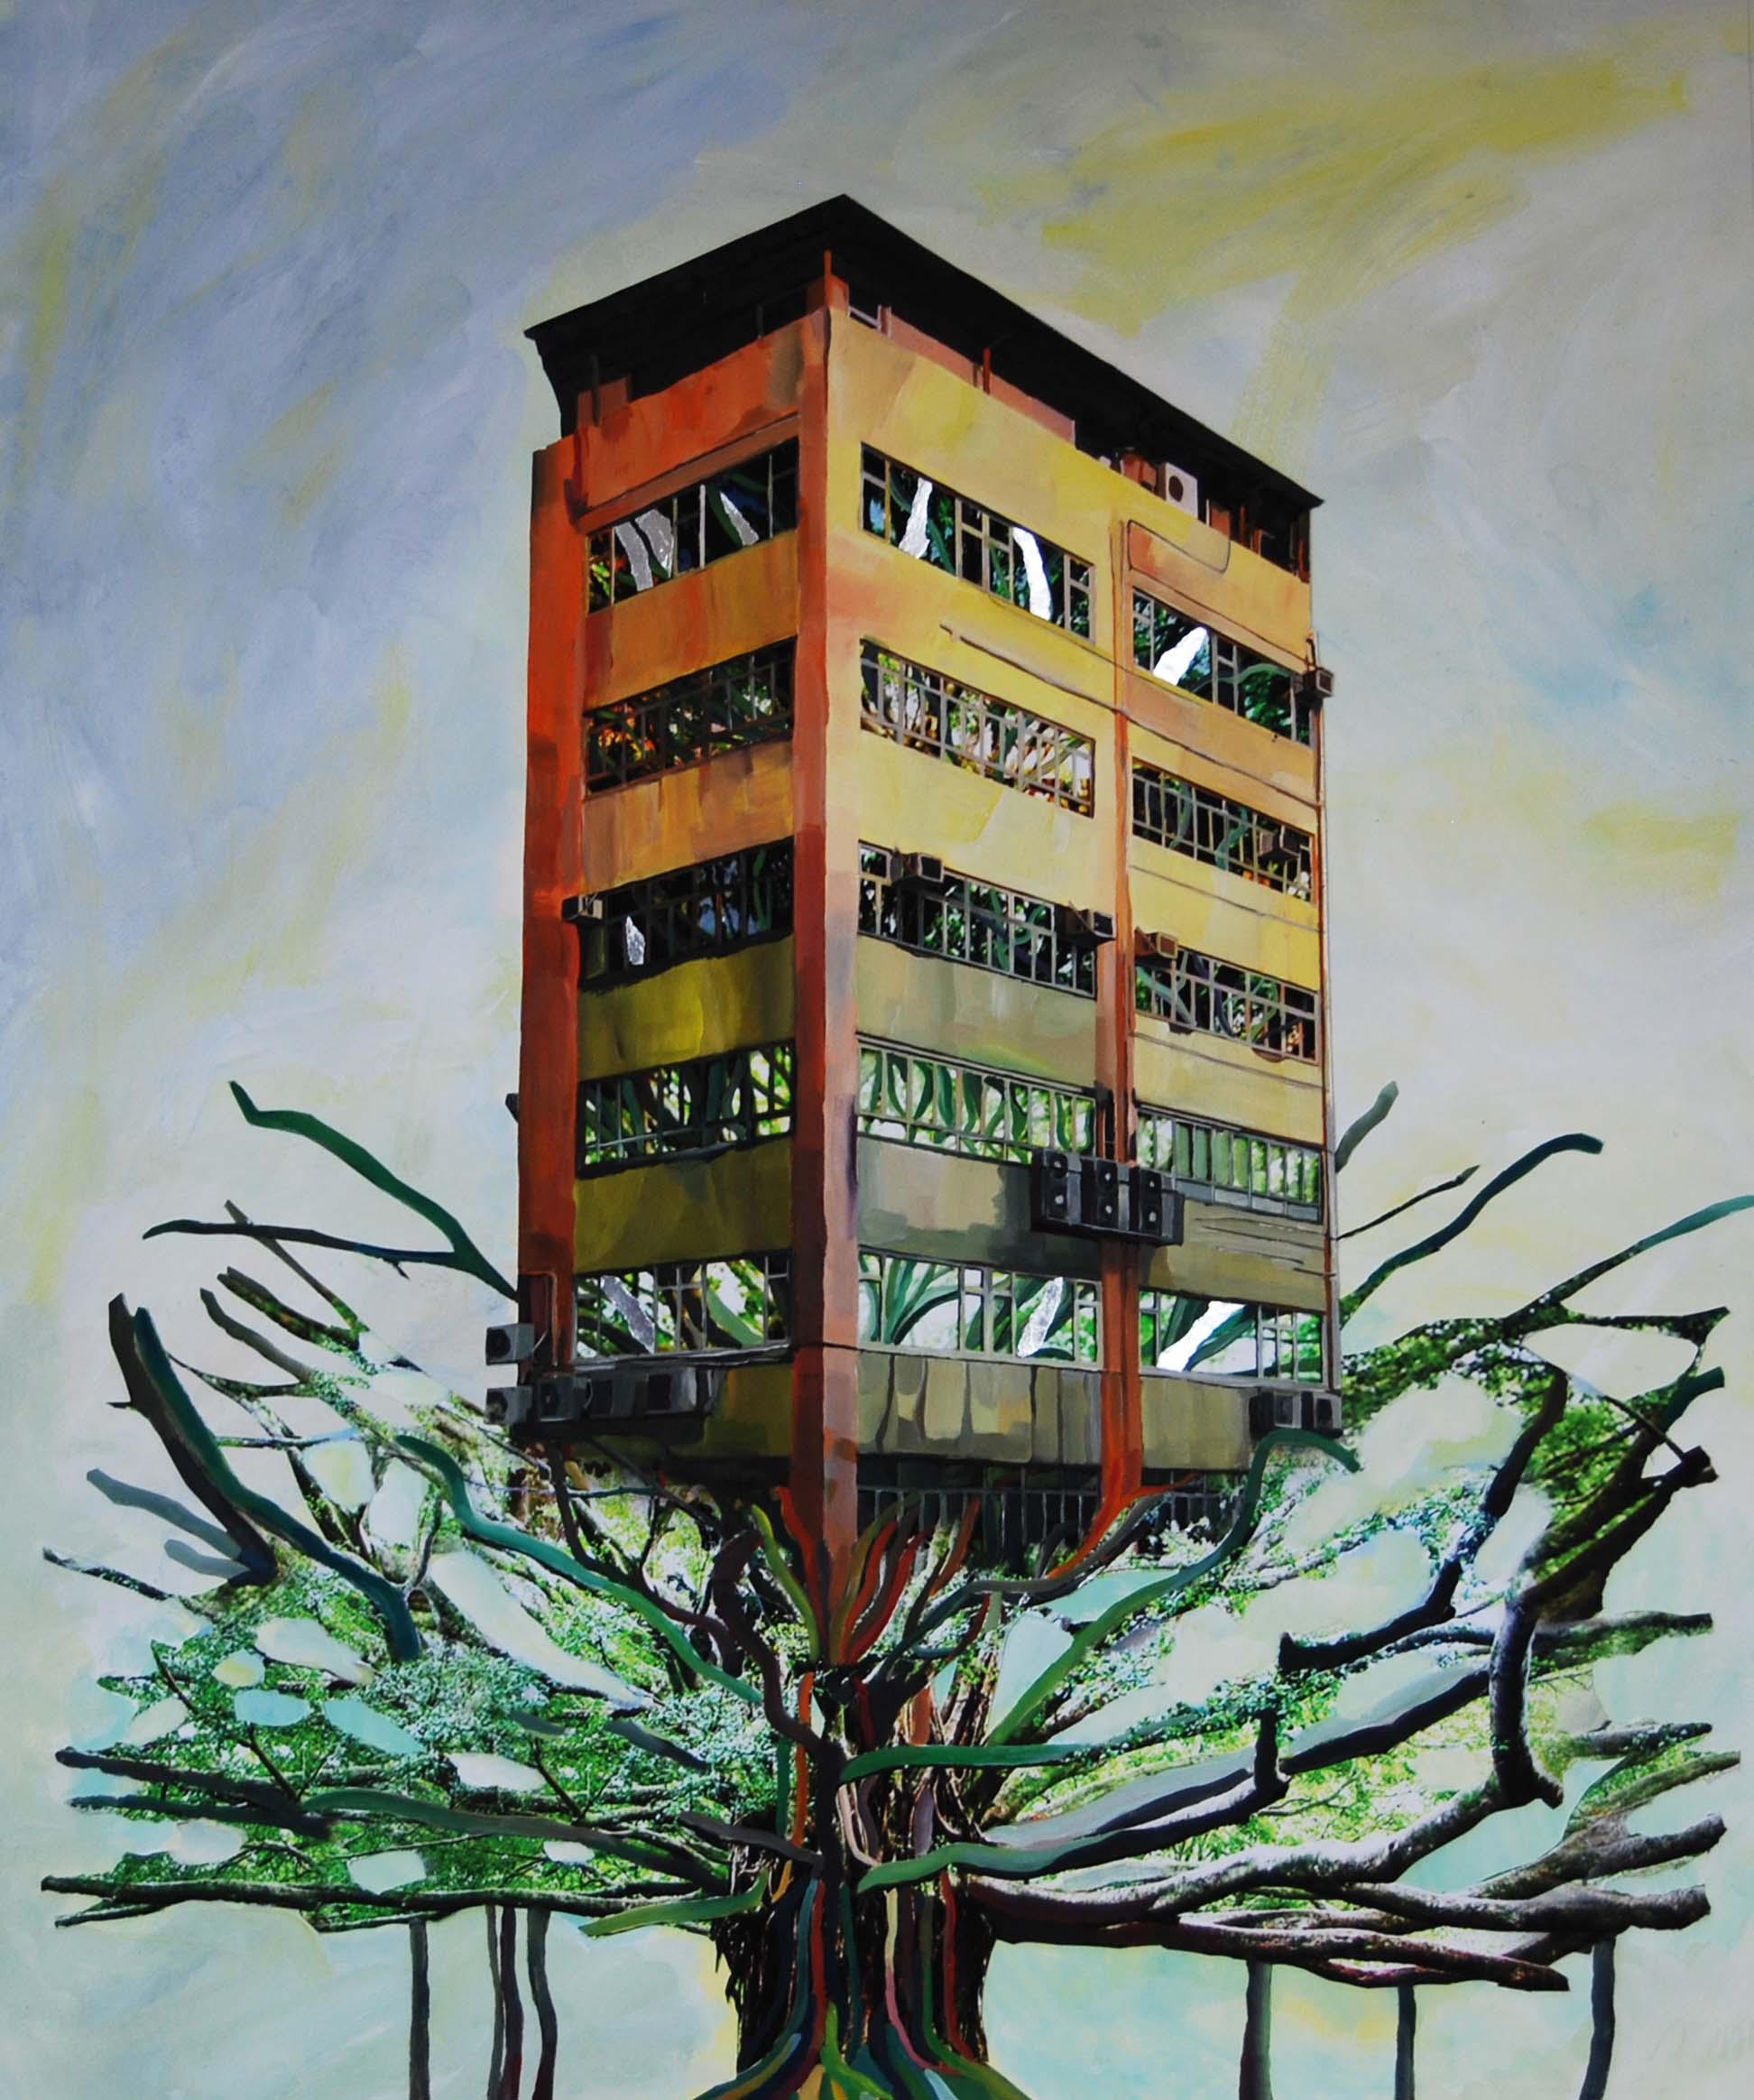 Banyan Tree House - 2014 (SOLD)